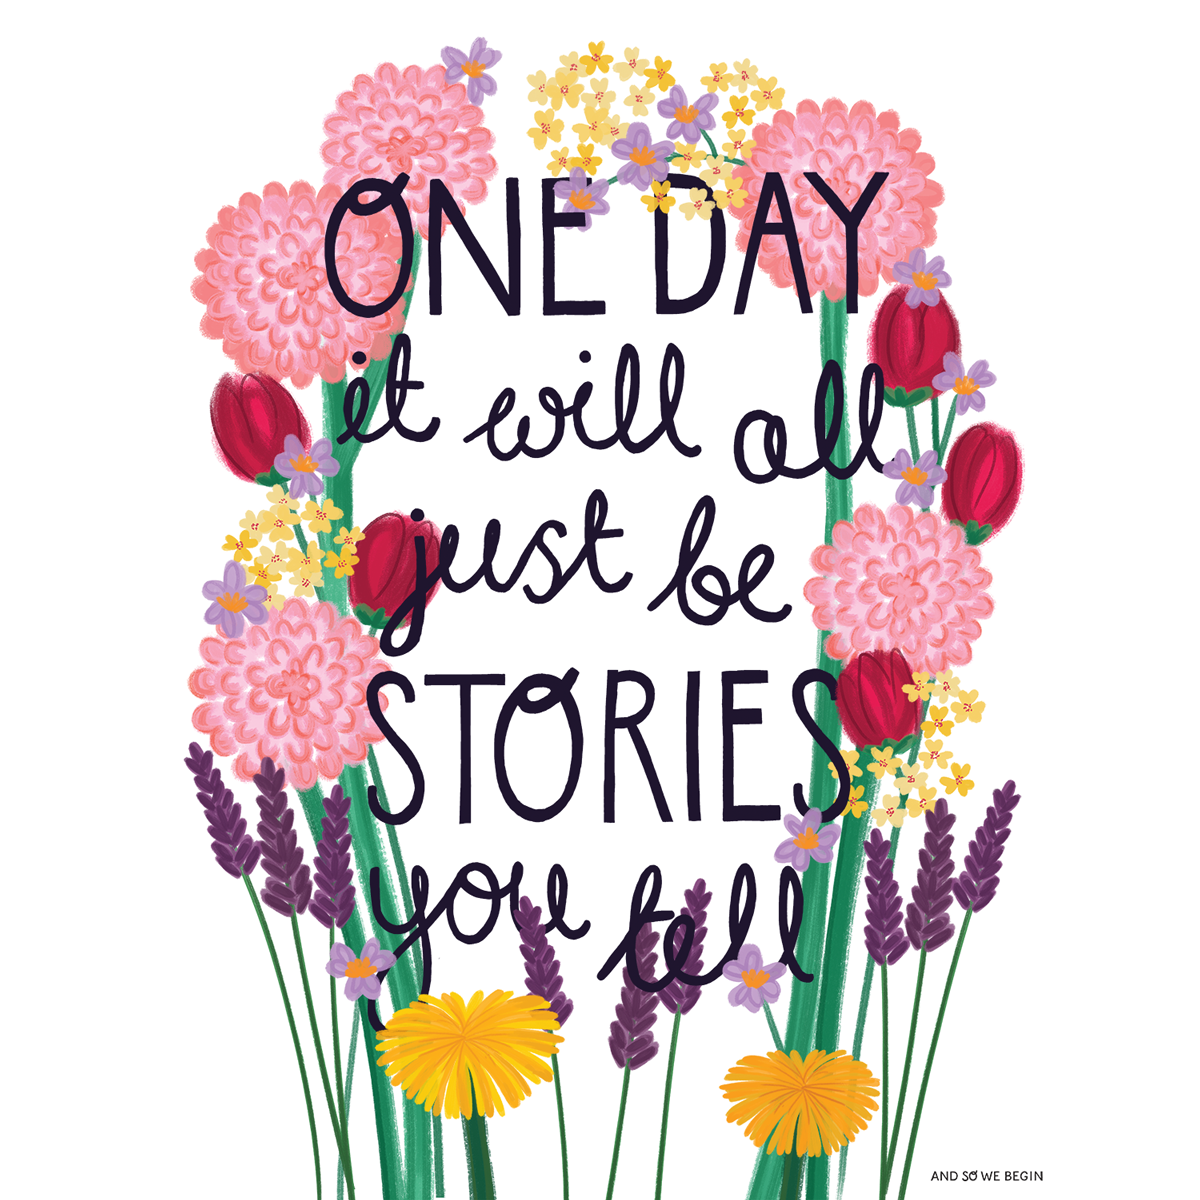 onedayitwillallbestoriesRGBsquare_light.png